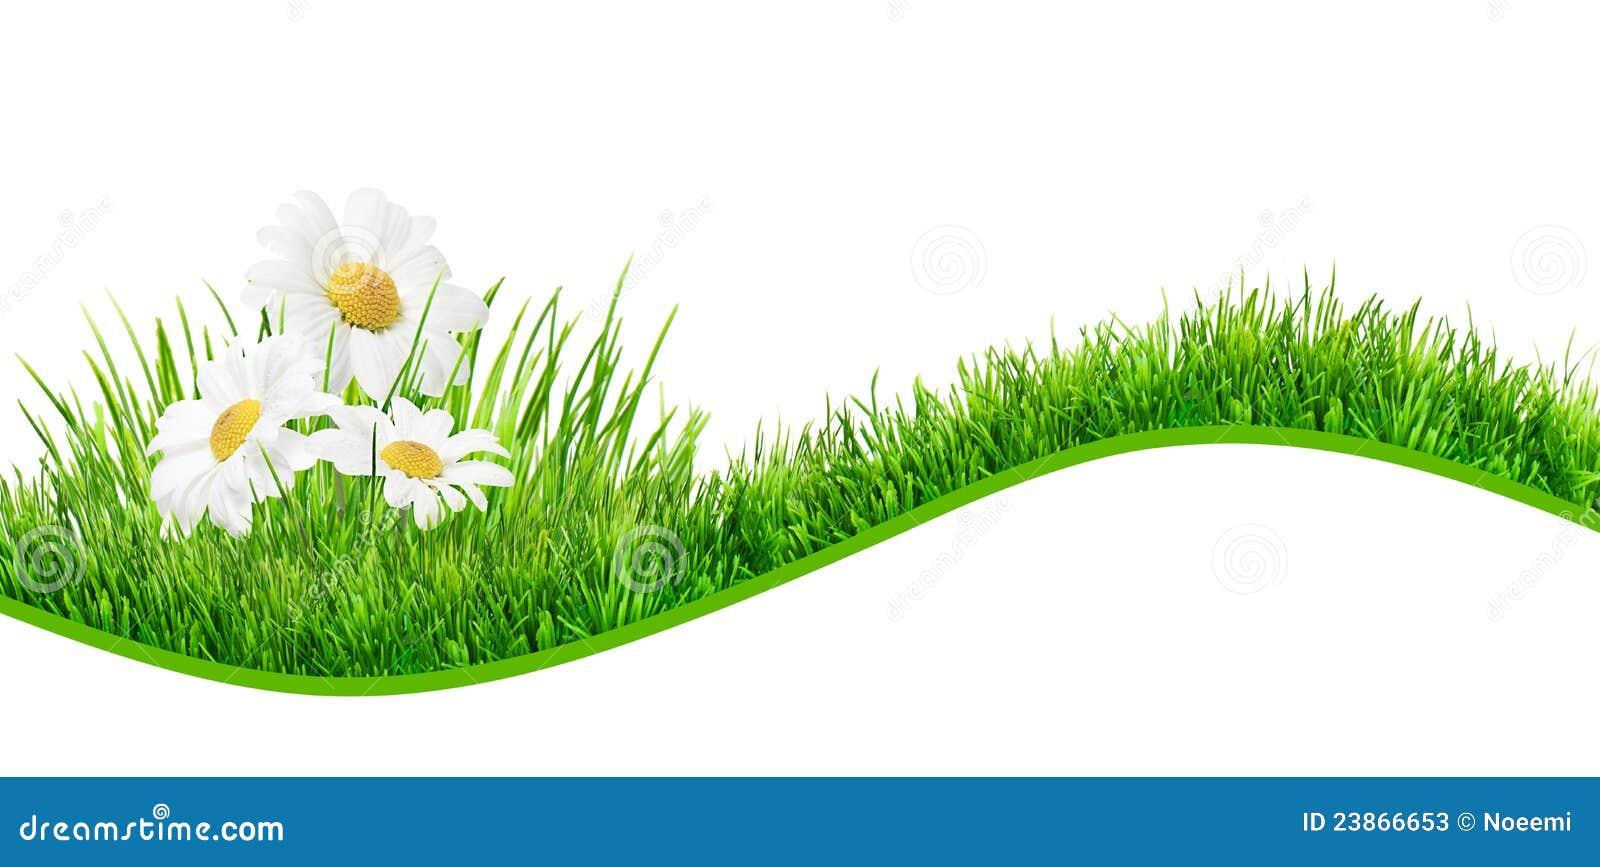 Daisies Banner Illustration 23866653 Megapixl